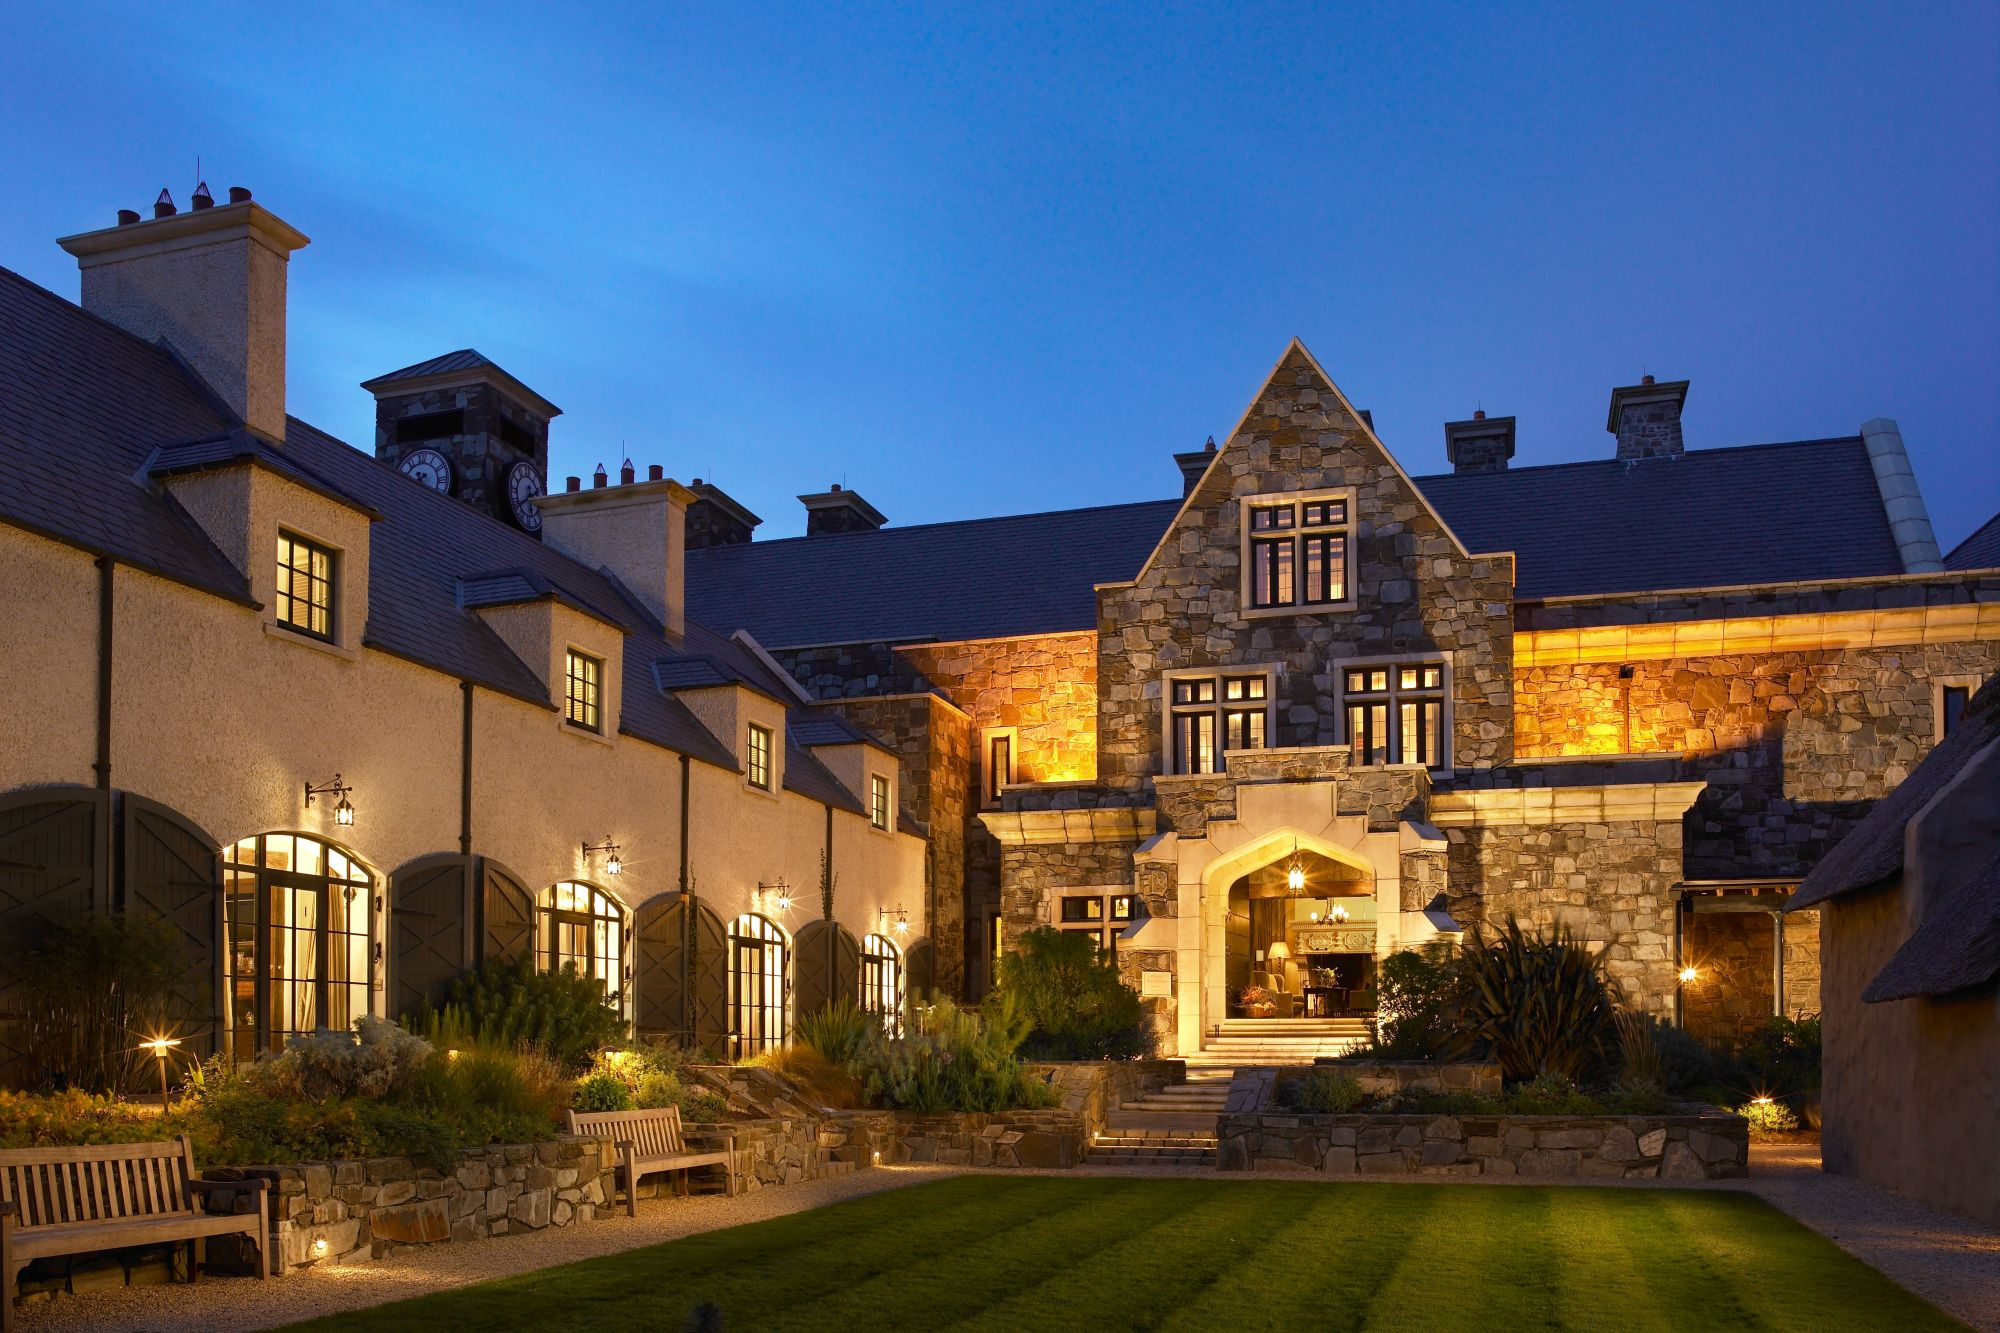 The Trump International Hotel Doonbeg | Golf Tours Ireland